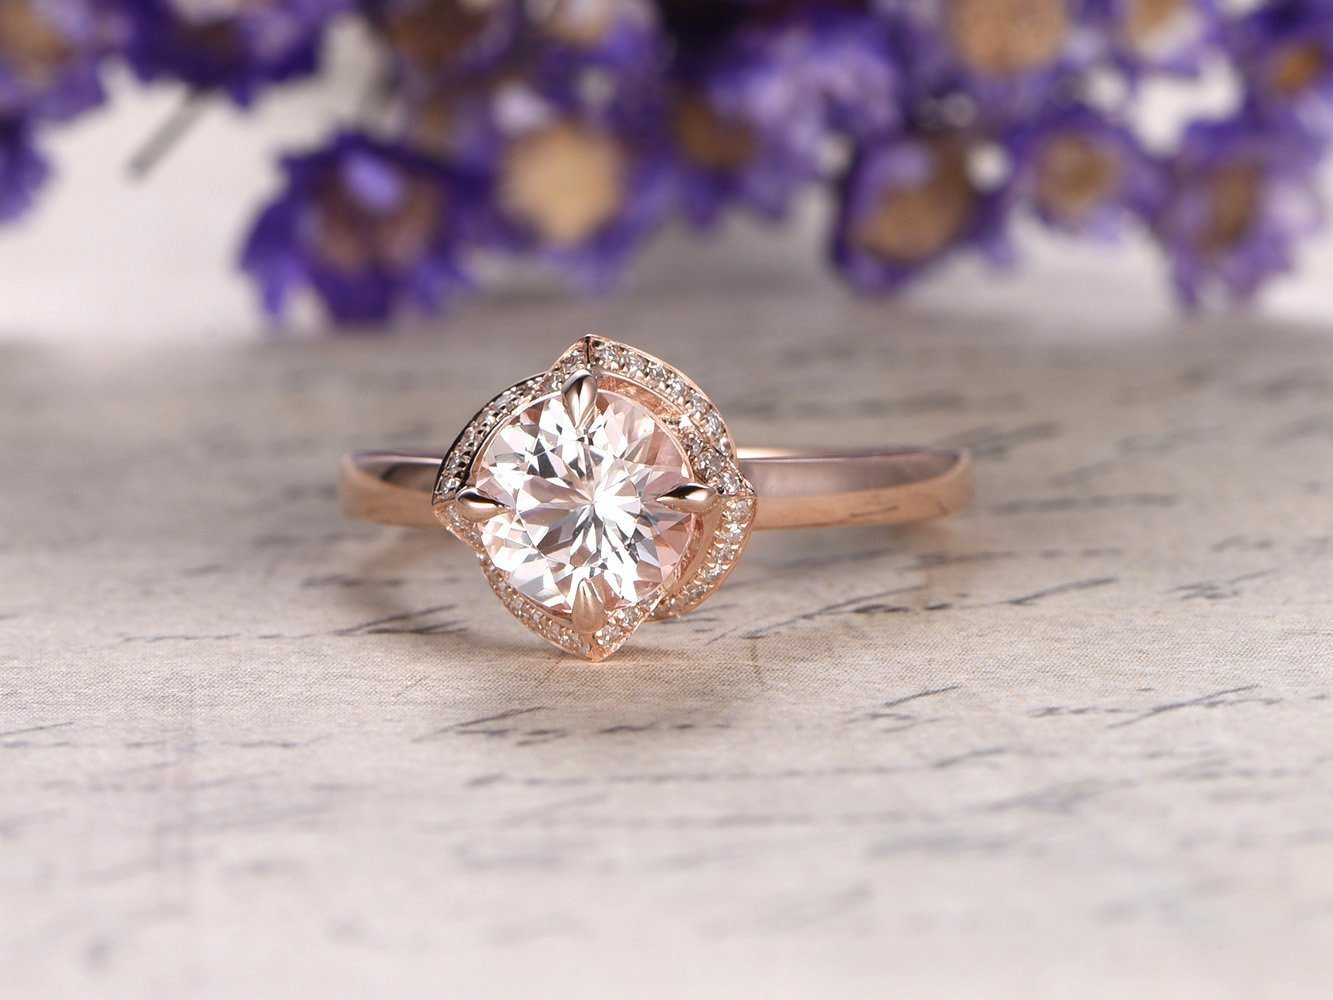 Morganite Ring Rose gold 6.5mm Round Cut Natural Pink Stone Floral Halo 14K Plain Rose Gold Band Morganite Engagement Ring size 5